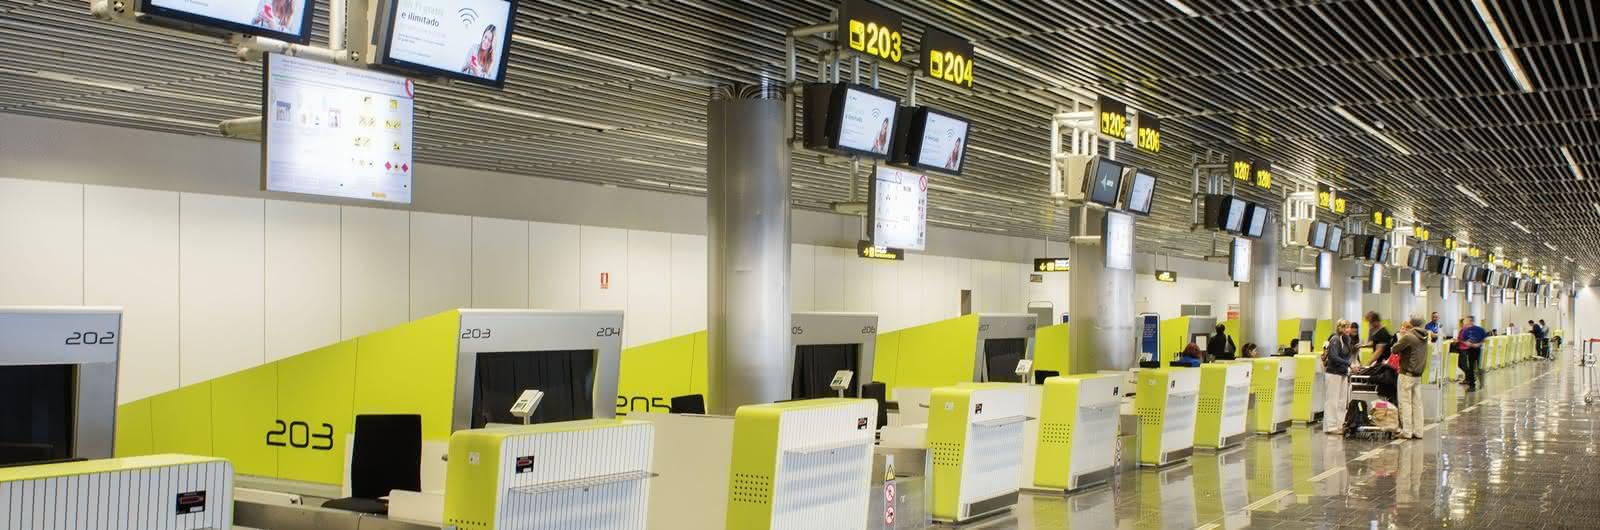 gran canaria airport header